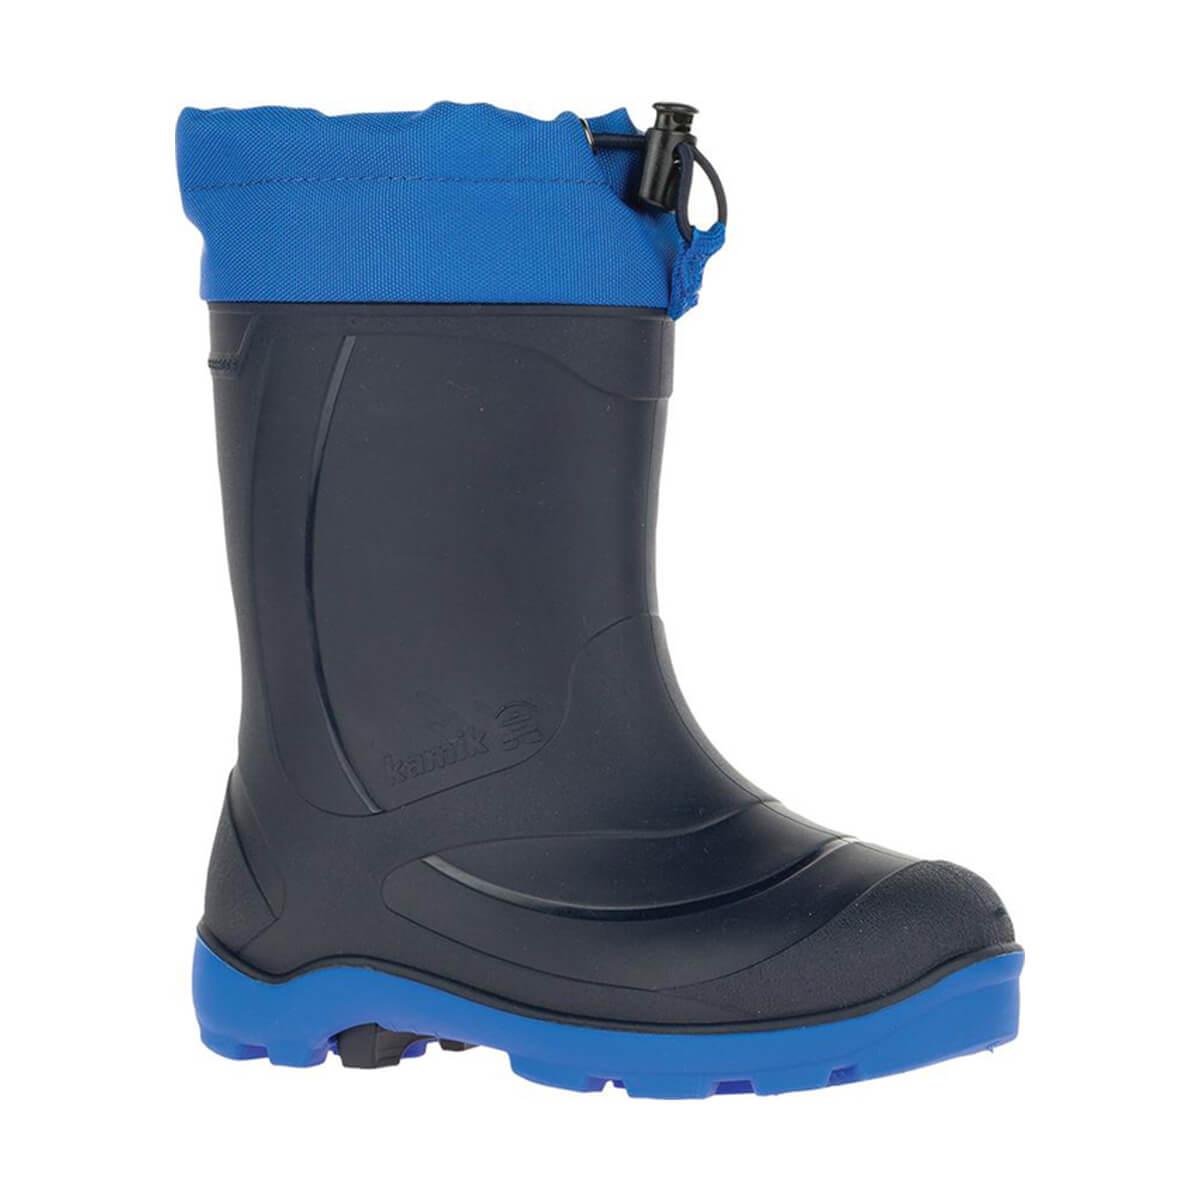 Kids Snowbuster 1 Winter Boot - Blue